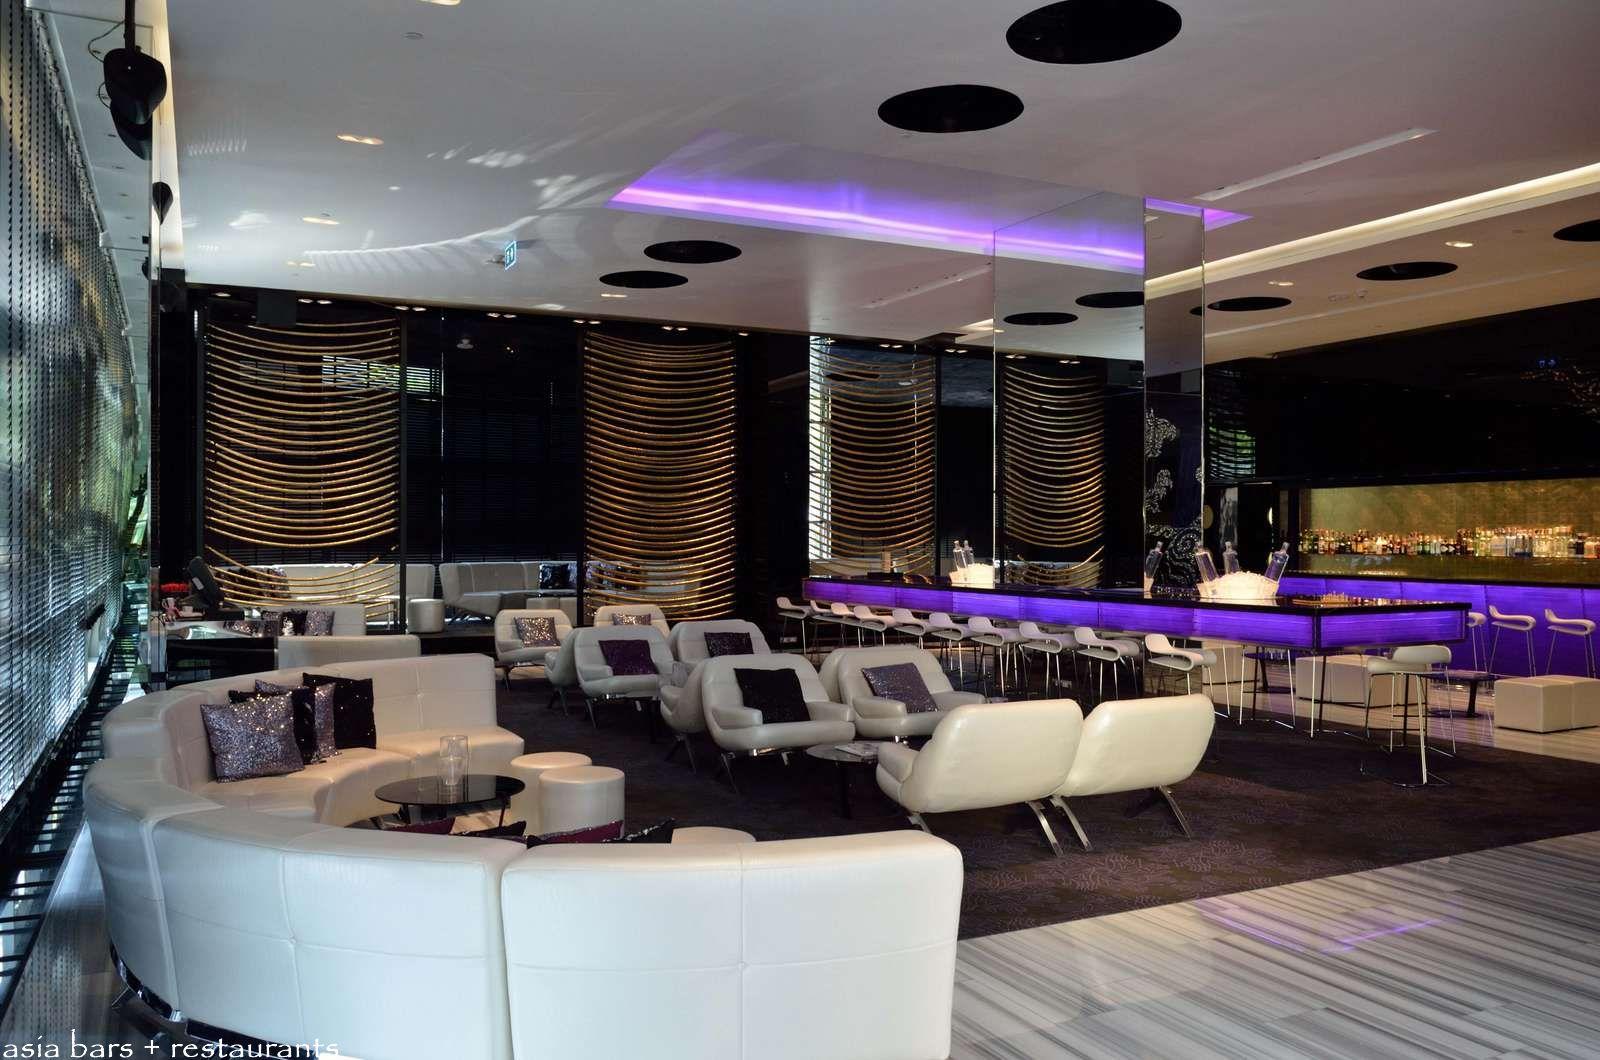 Woobar bar lounge at w bangkok asia bars restaurants - Interior leather bar free online ...